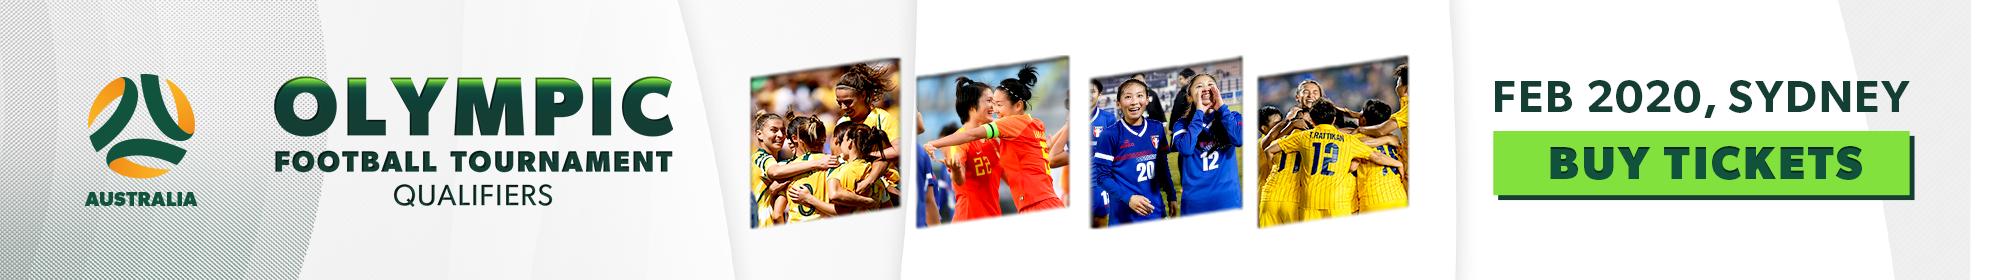 Matildas Olympics qualifying banner